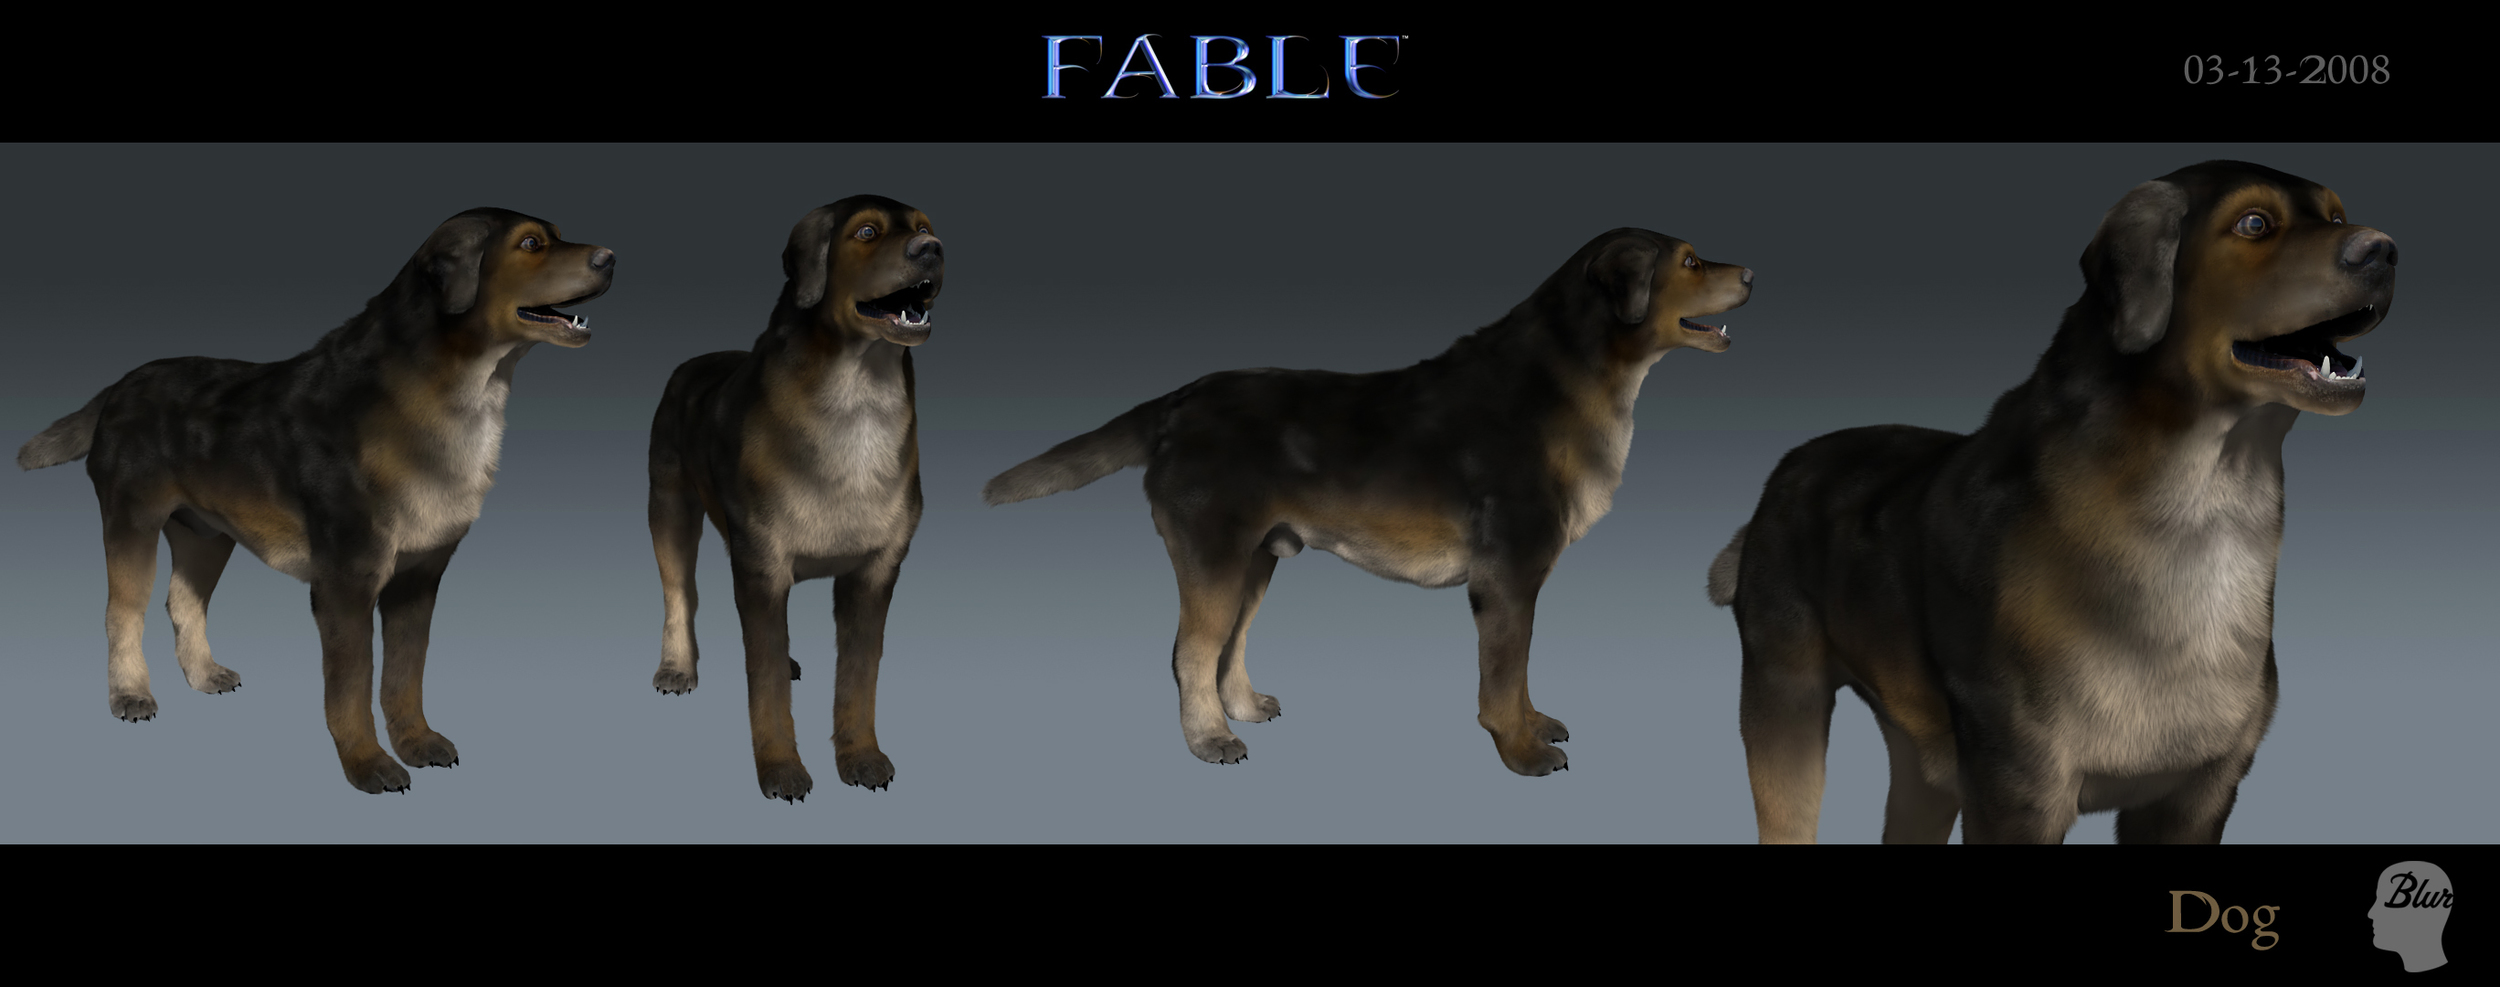 Dog_2008-03-13.jpg